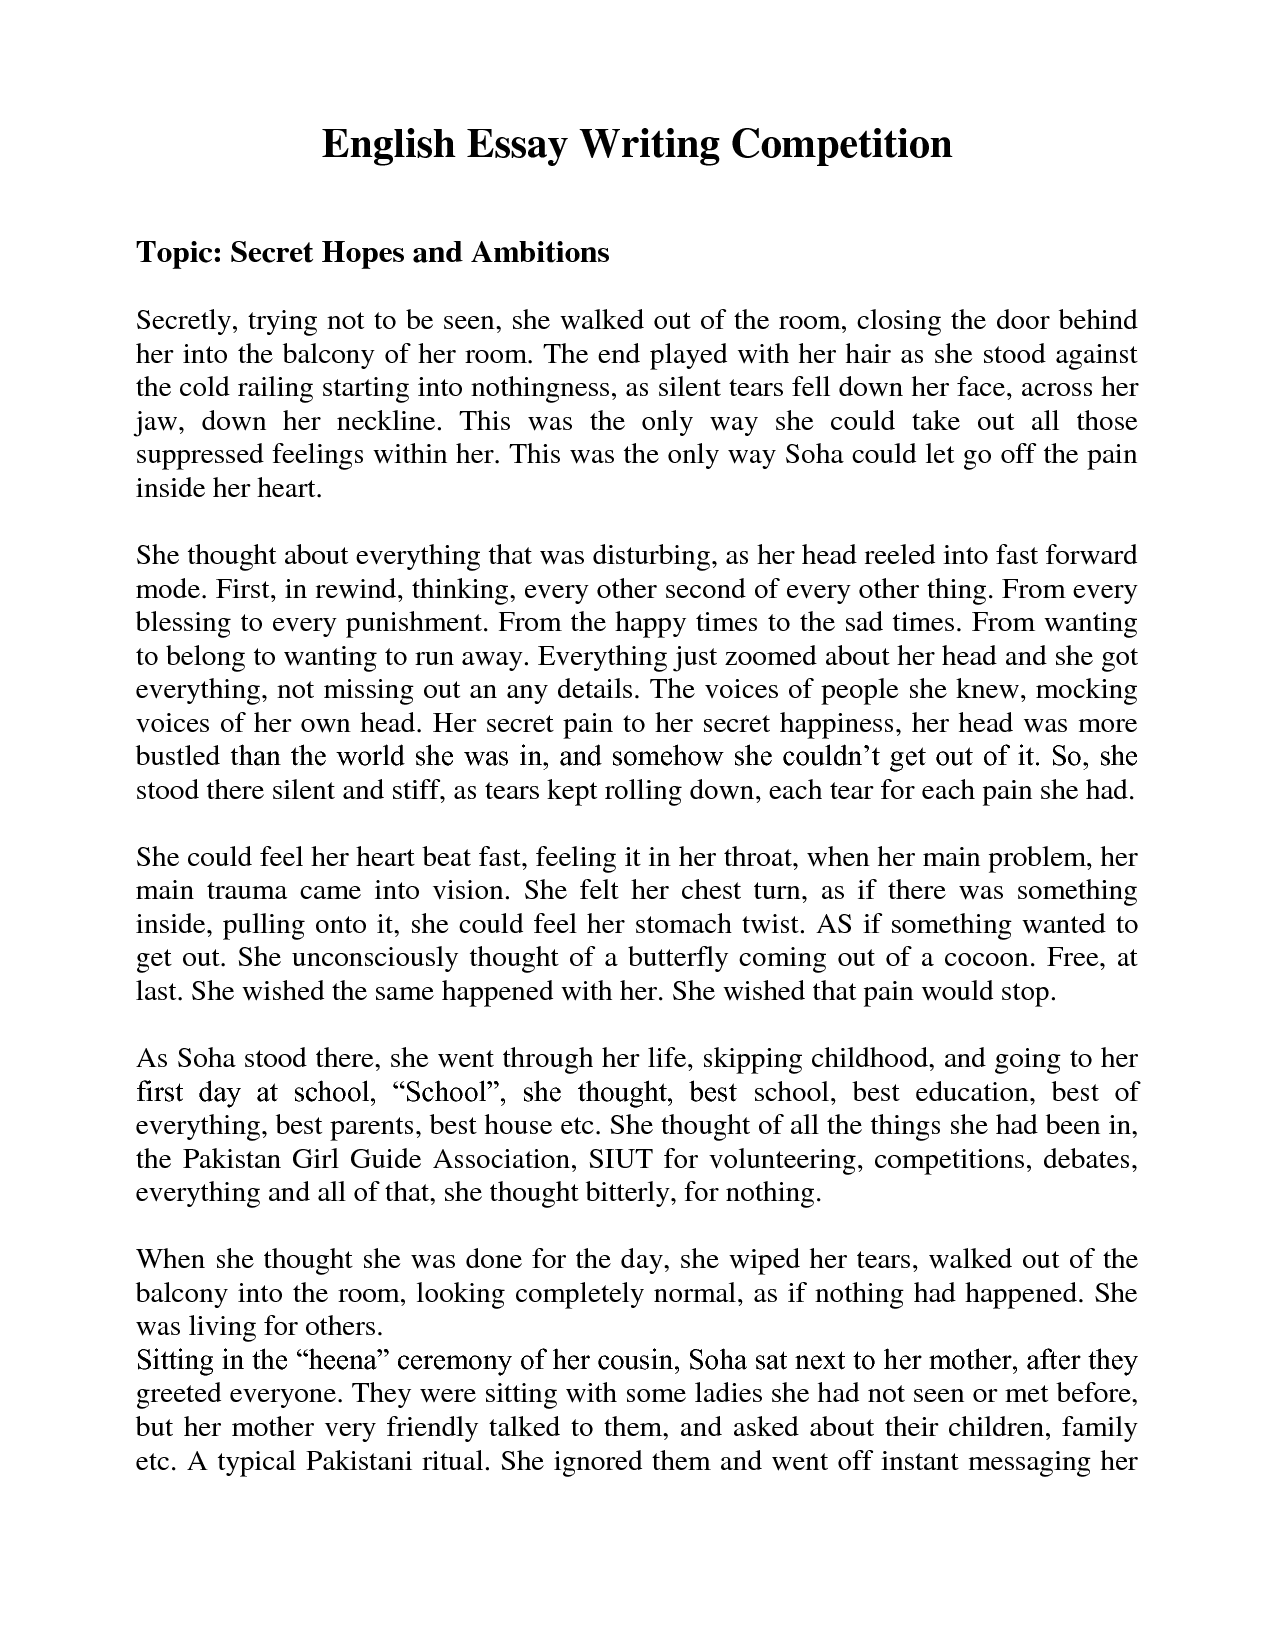 002 Y0m68b9dyd Essay Example English Dreaded Topics Literature Question Paper For Class 10 Icse 2015 Maharashtra Board Full